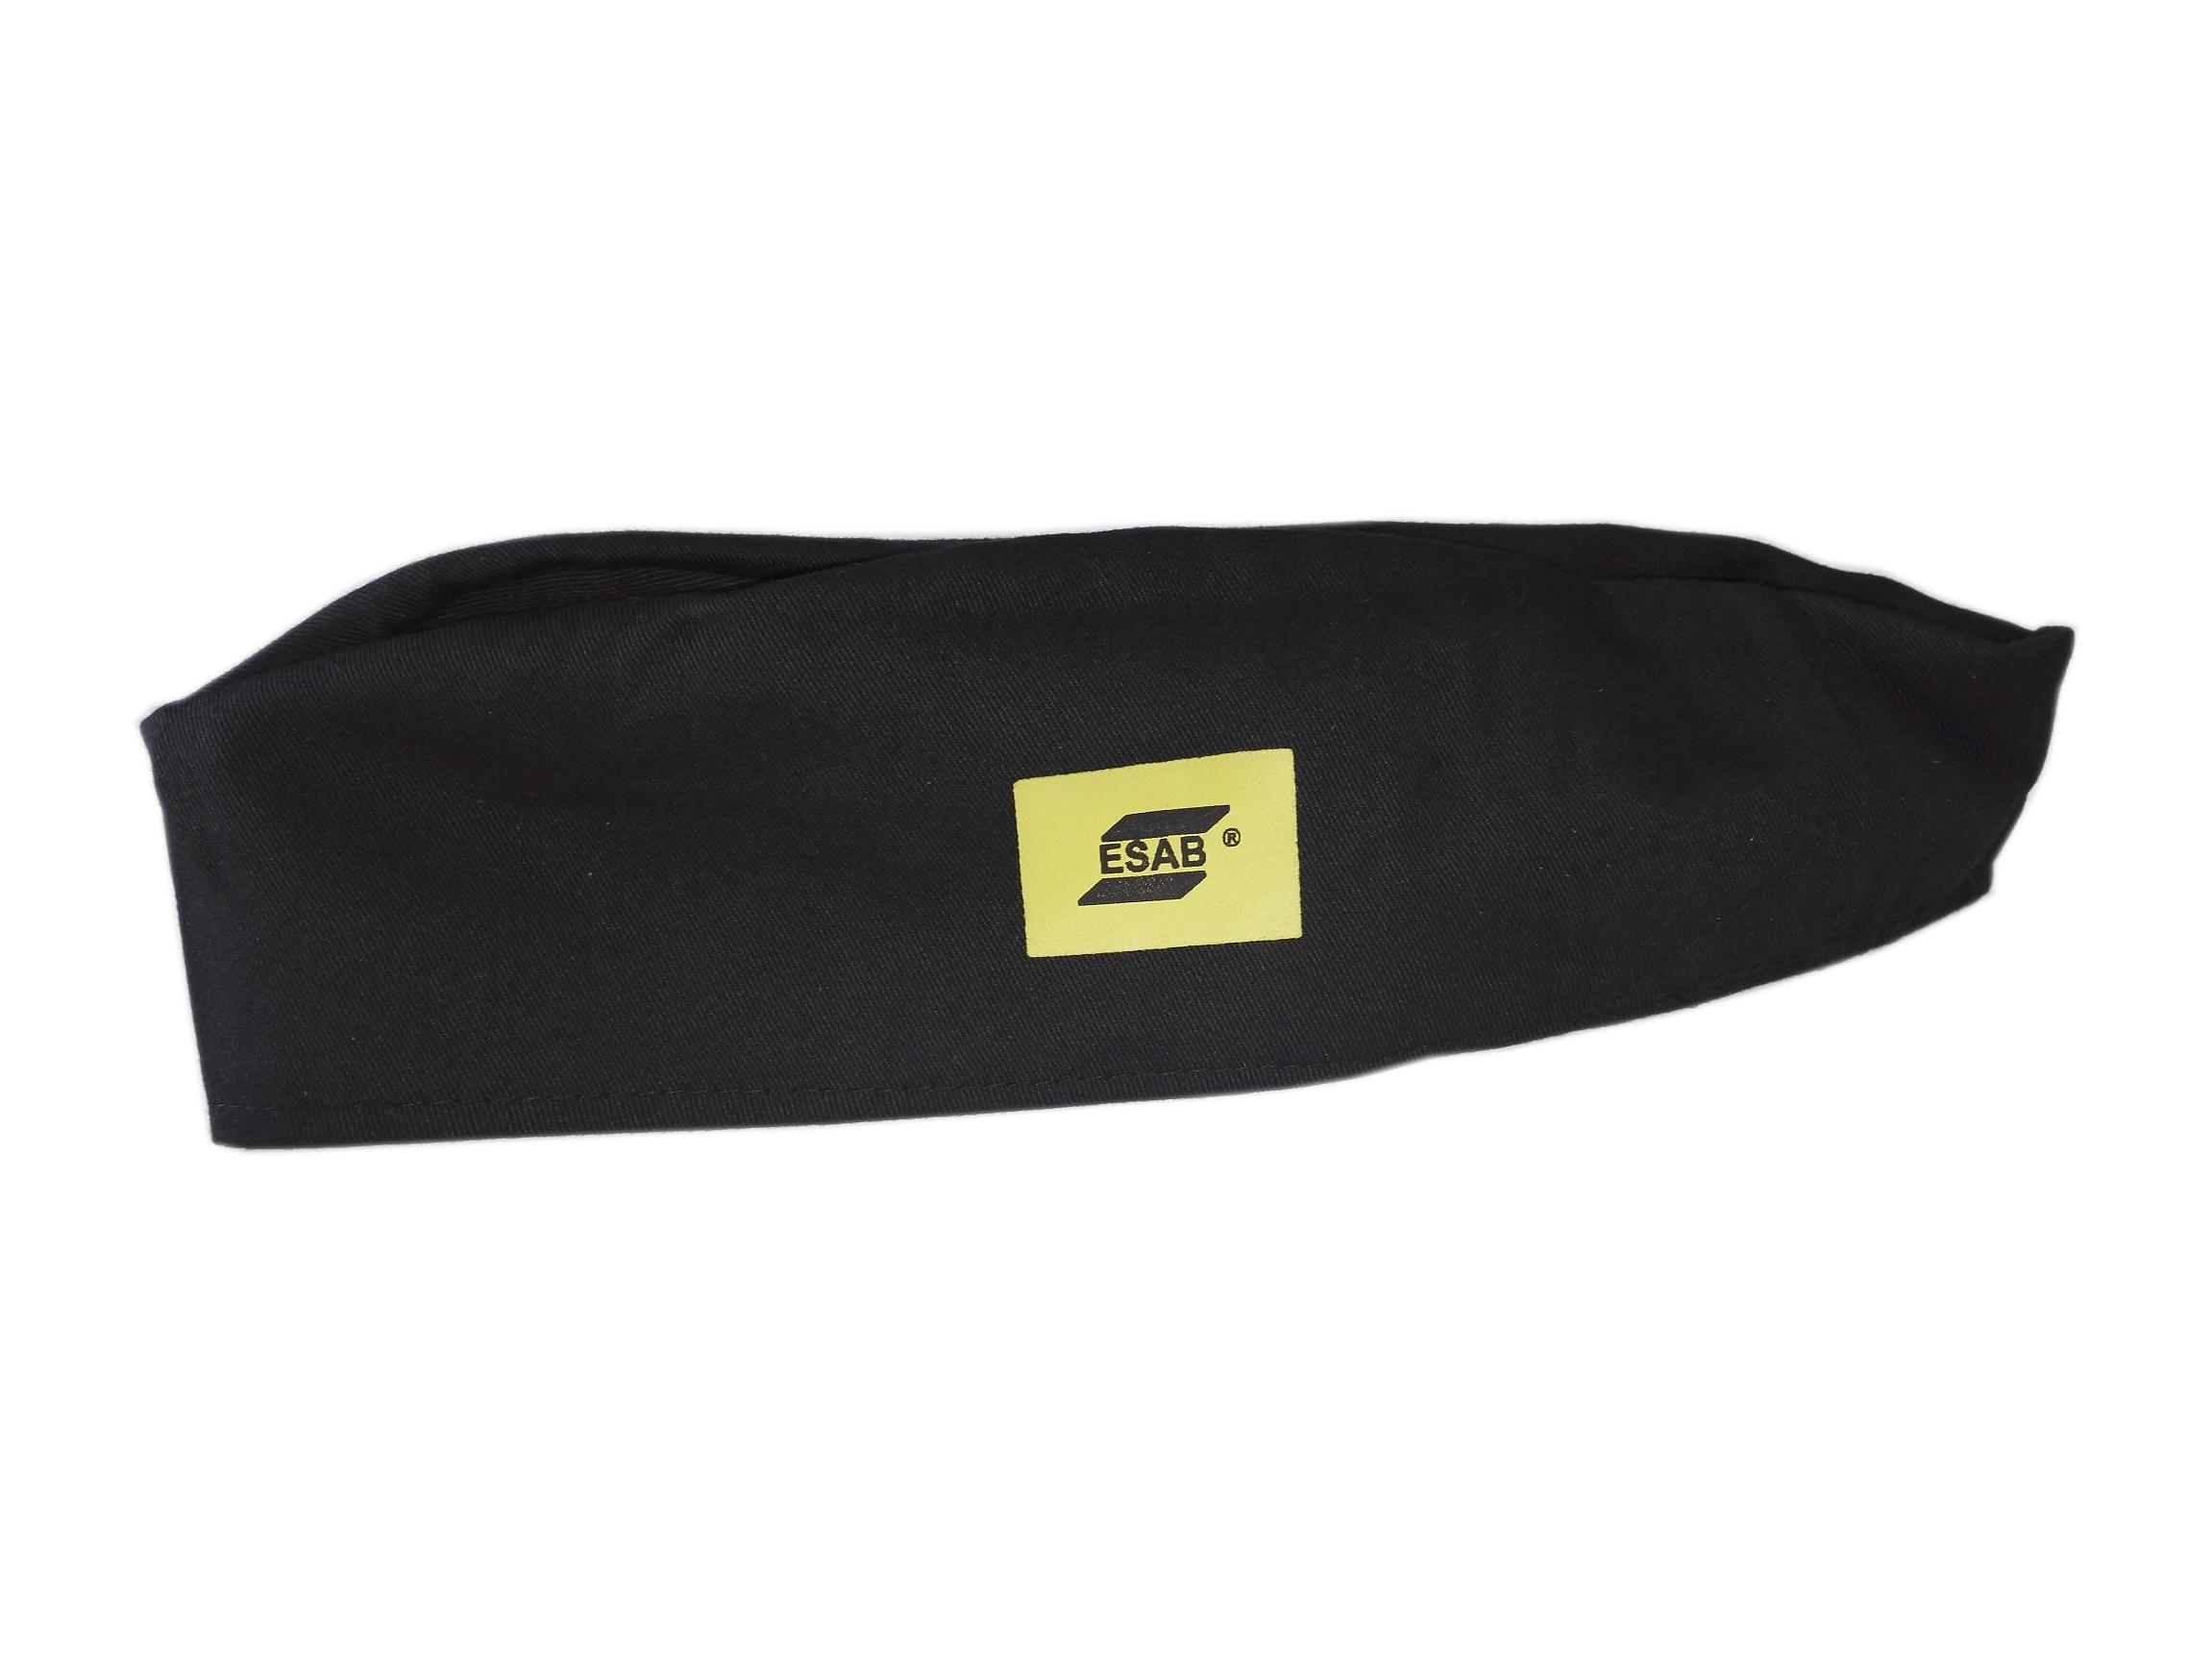 Zvárací klobúk ESAB FRAY MASK